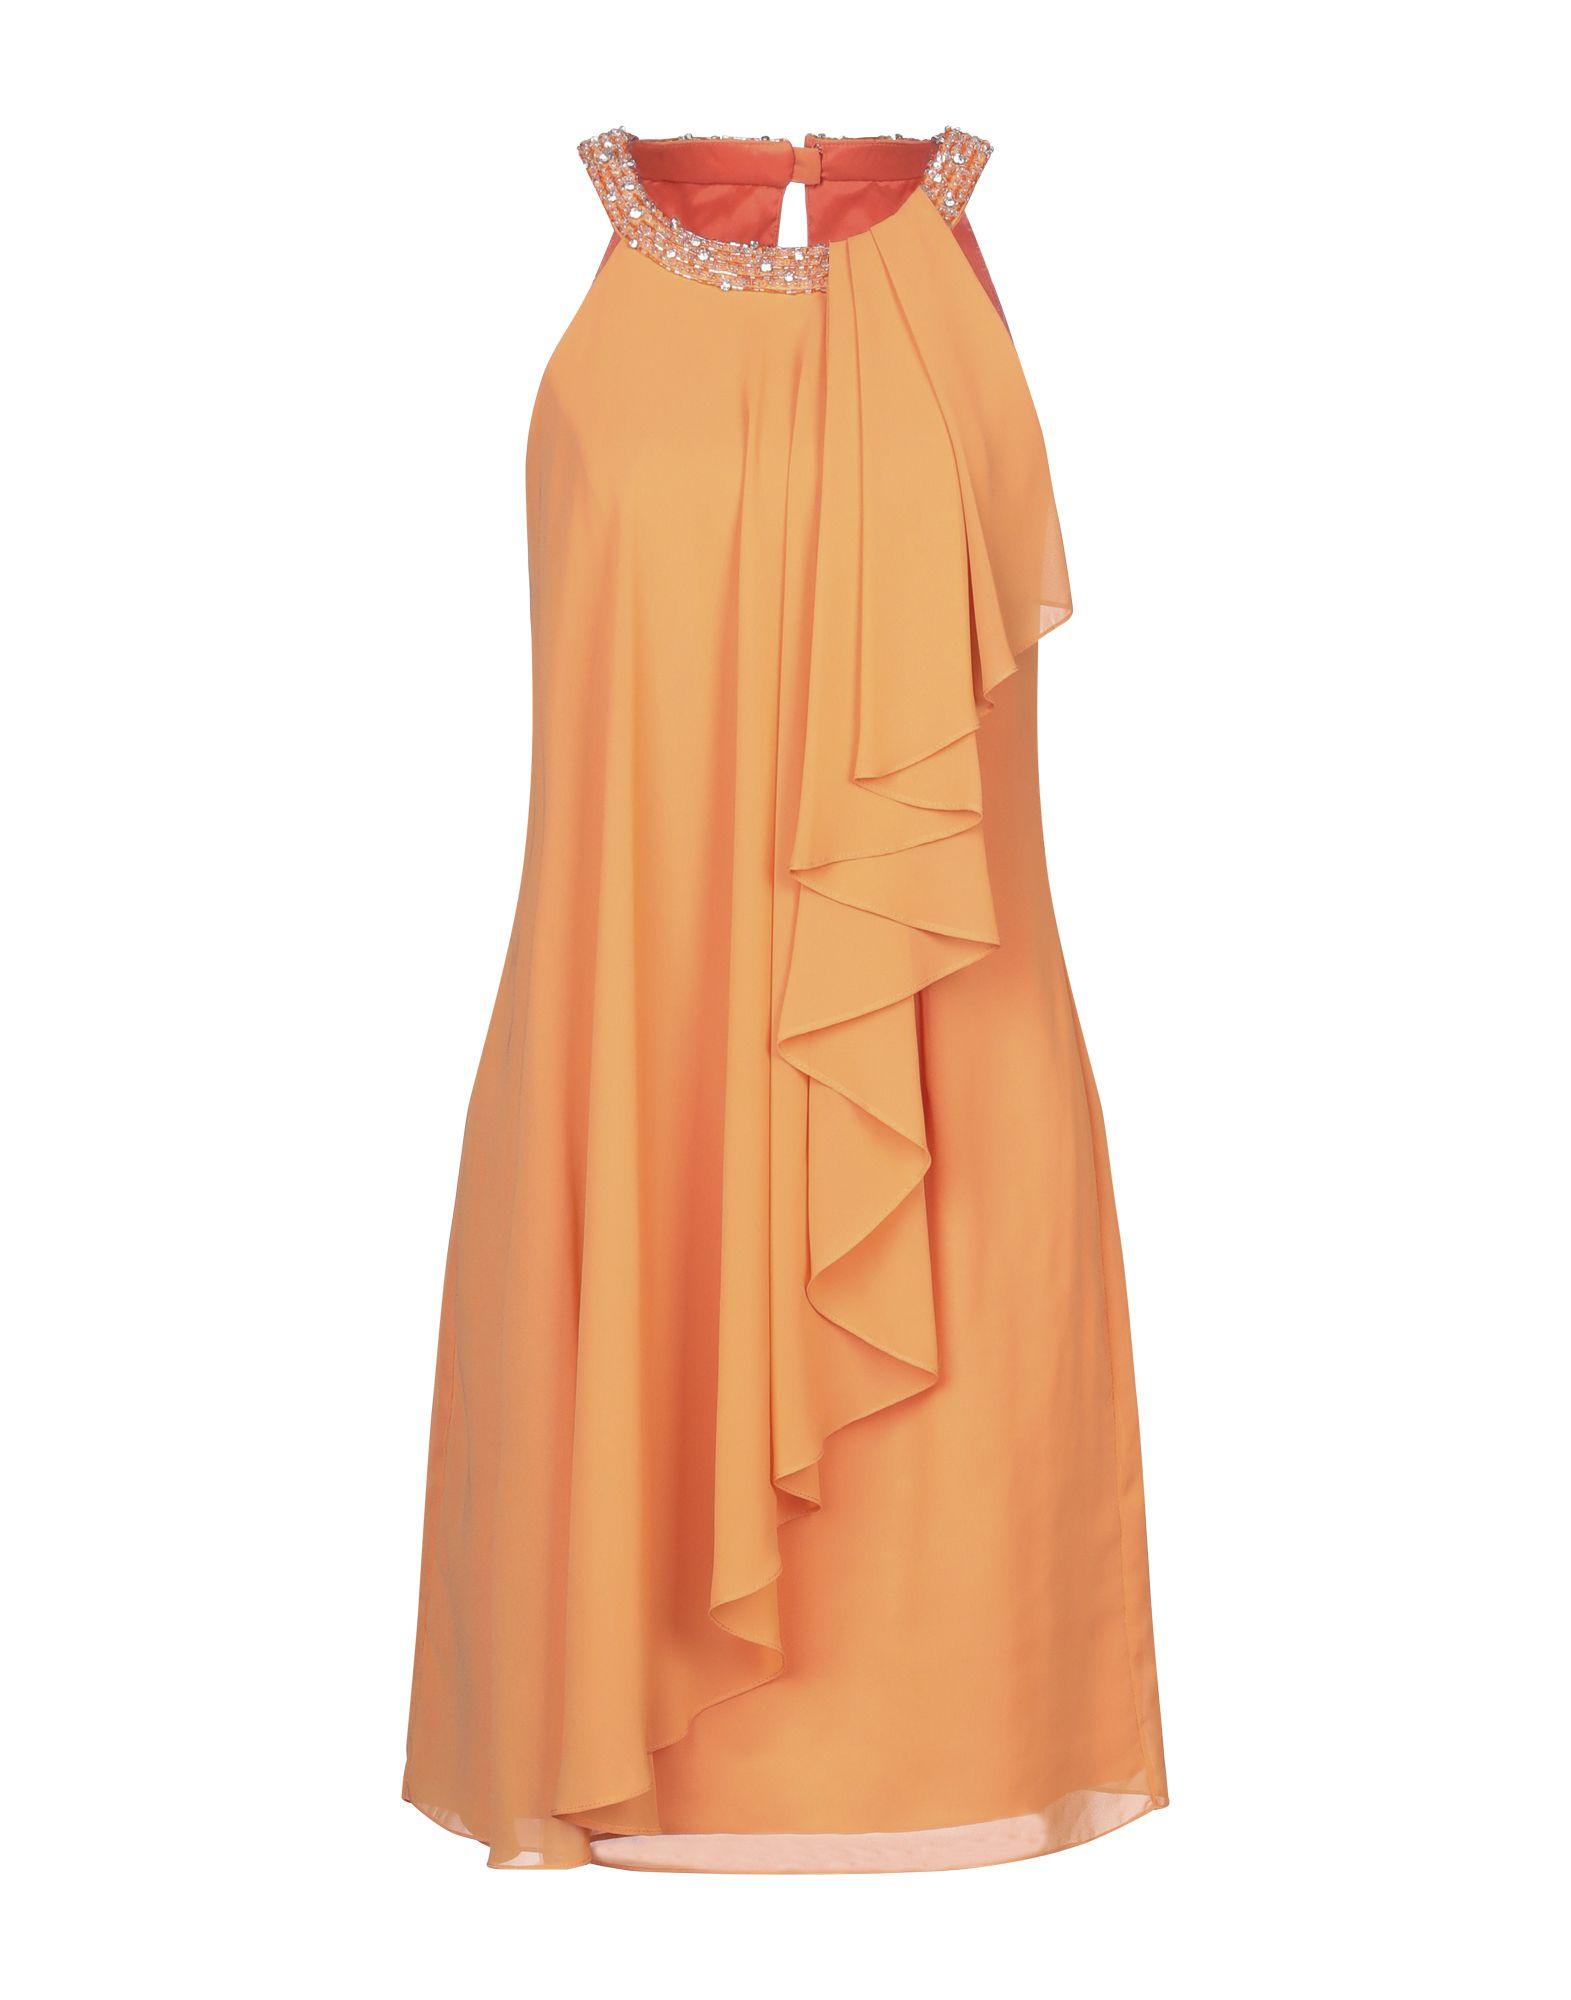 FABIANA FERRI Платье до колена